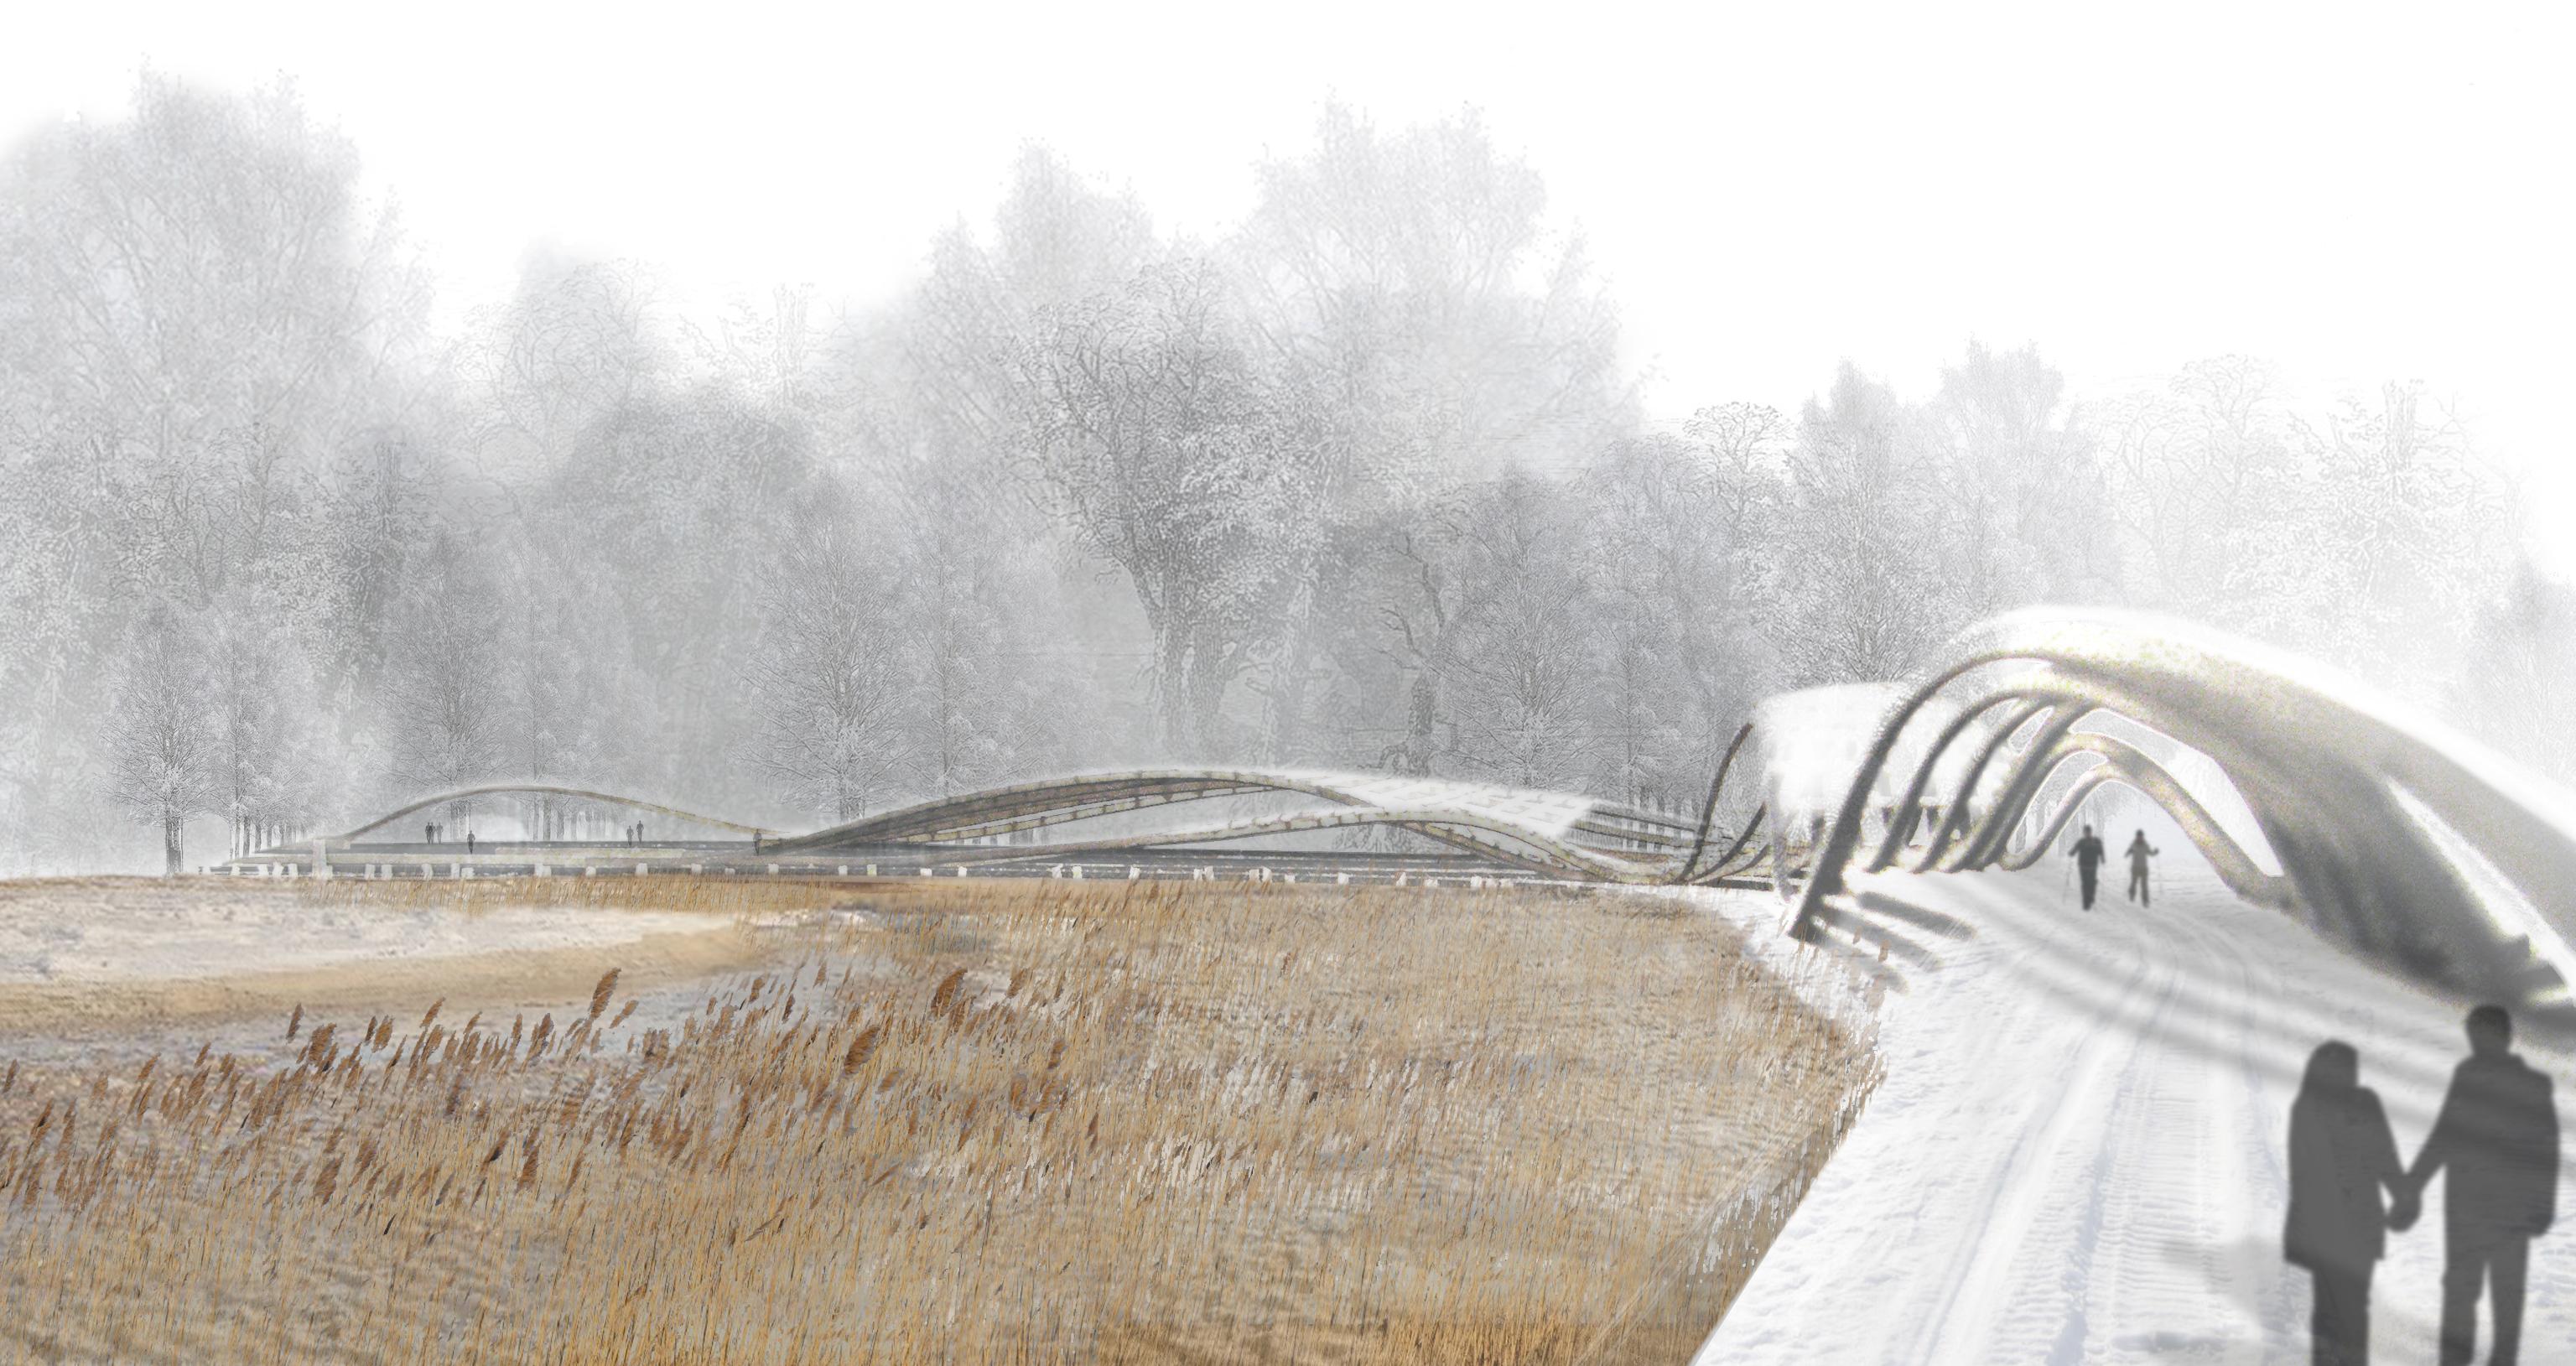 render_final_on bridge view